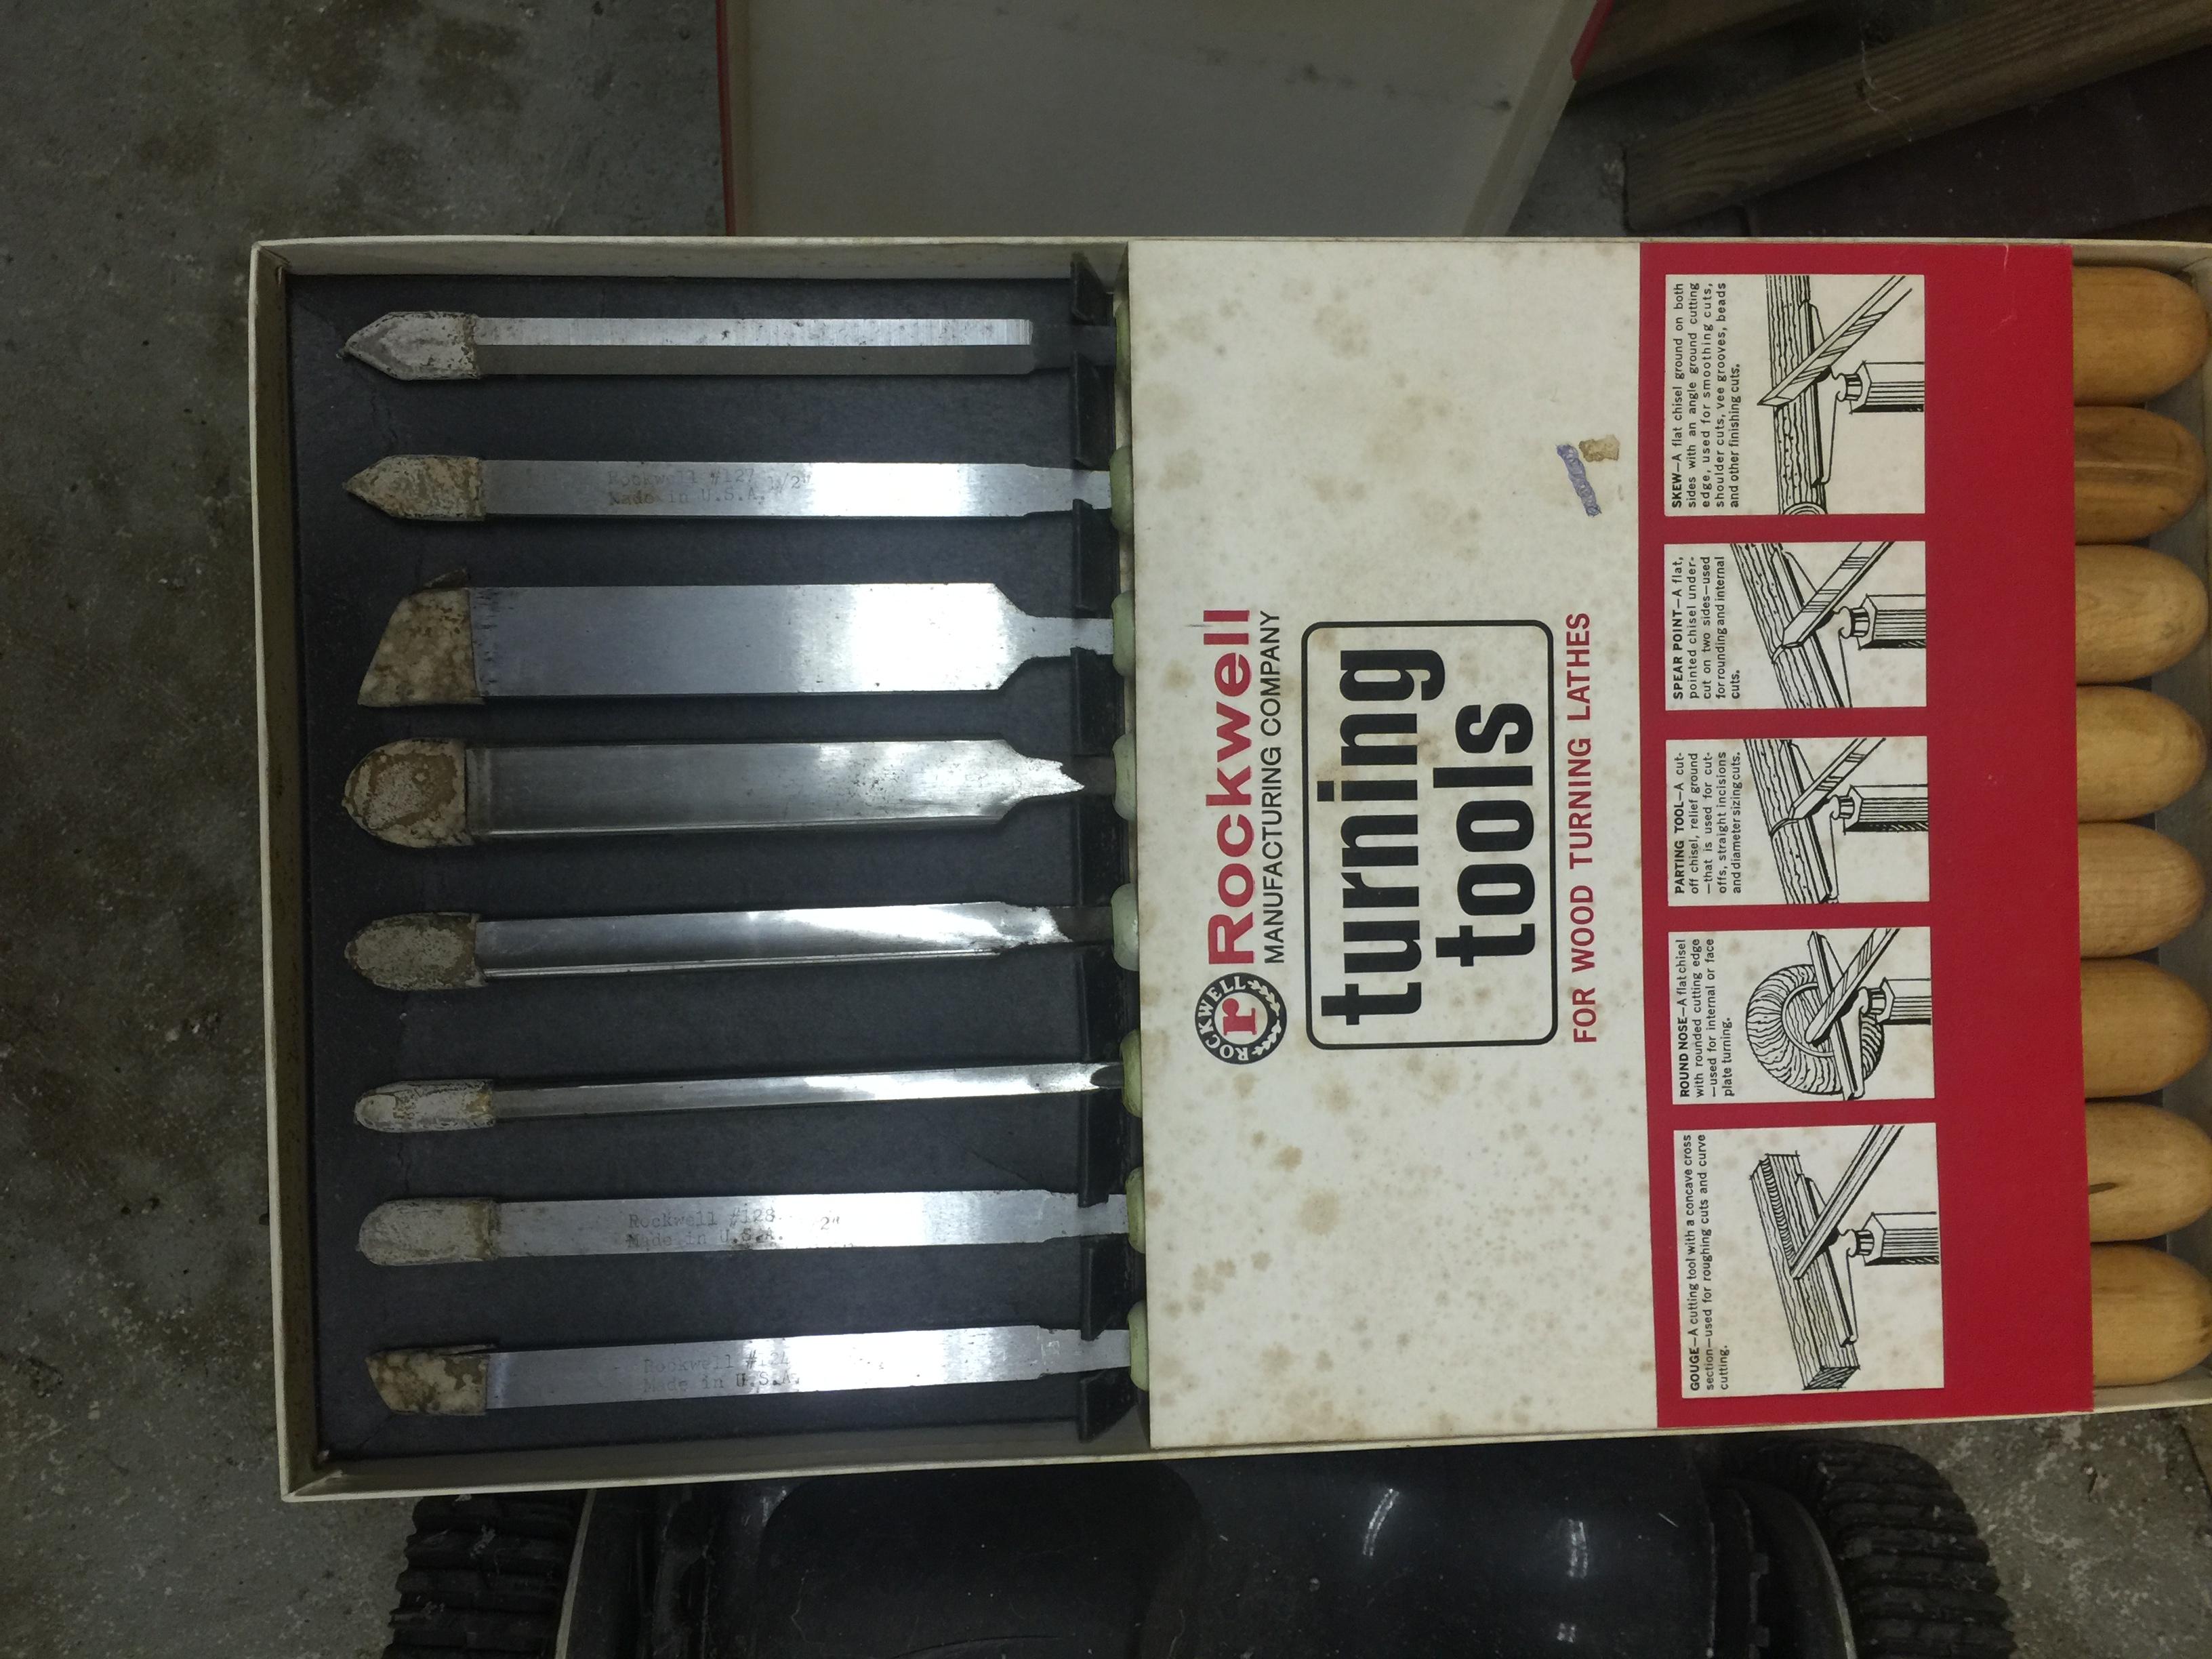 lathe tools